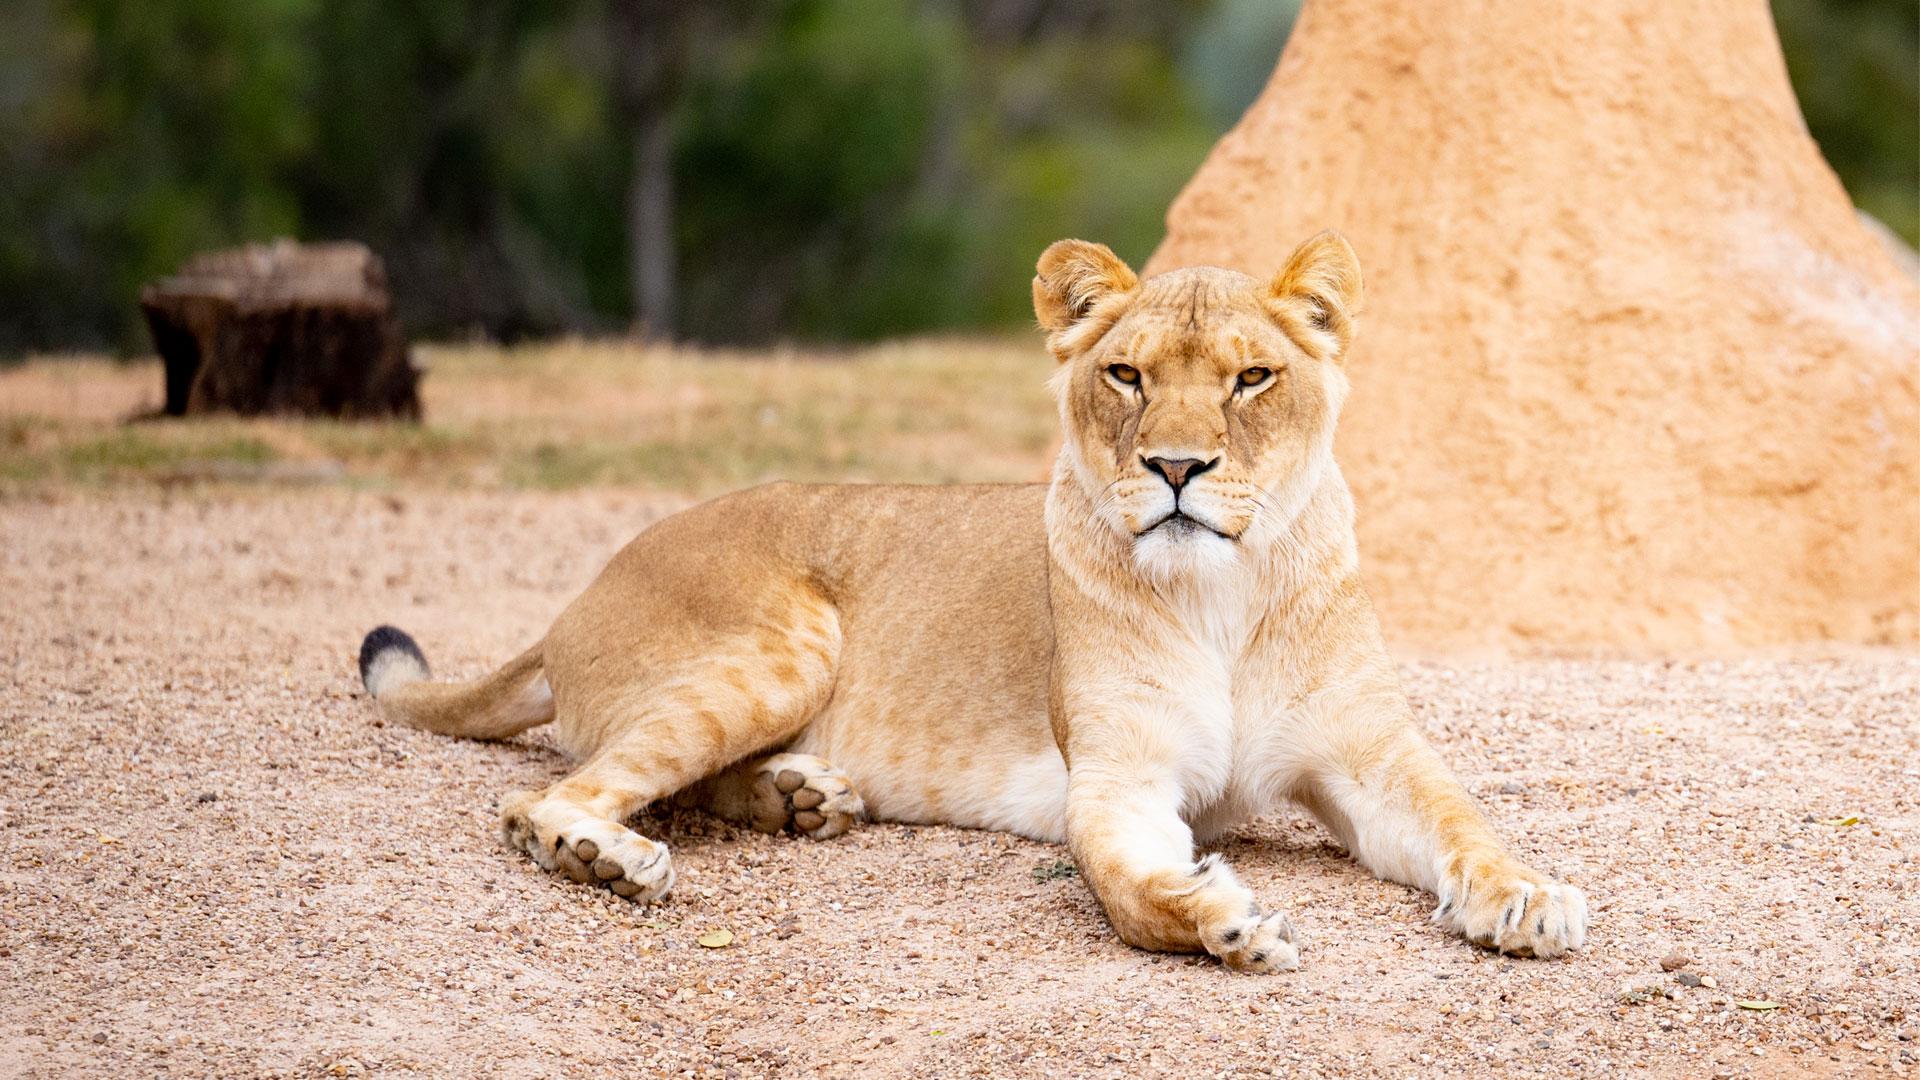 https://rfacdn.nz/zoo/assets/media/lioness-aziza-gallery-3.jpg